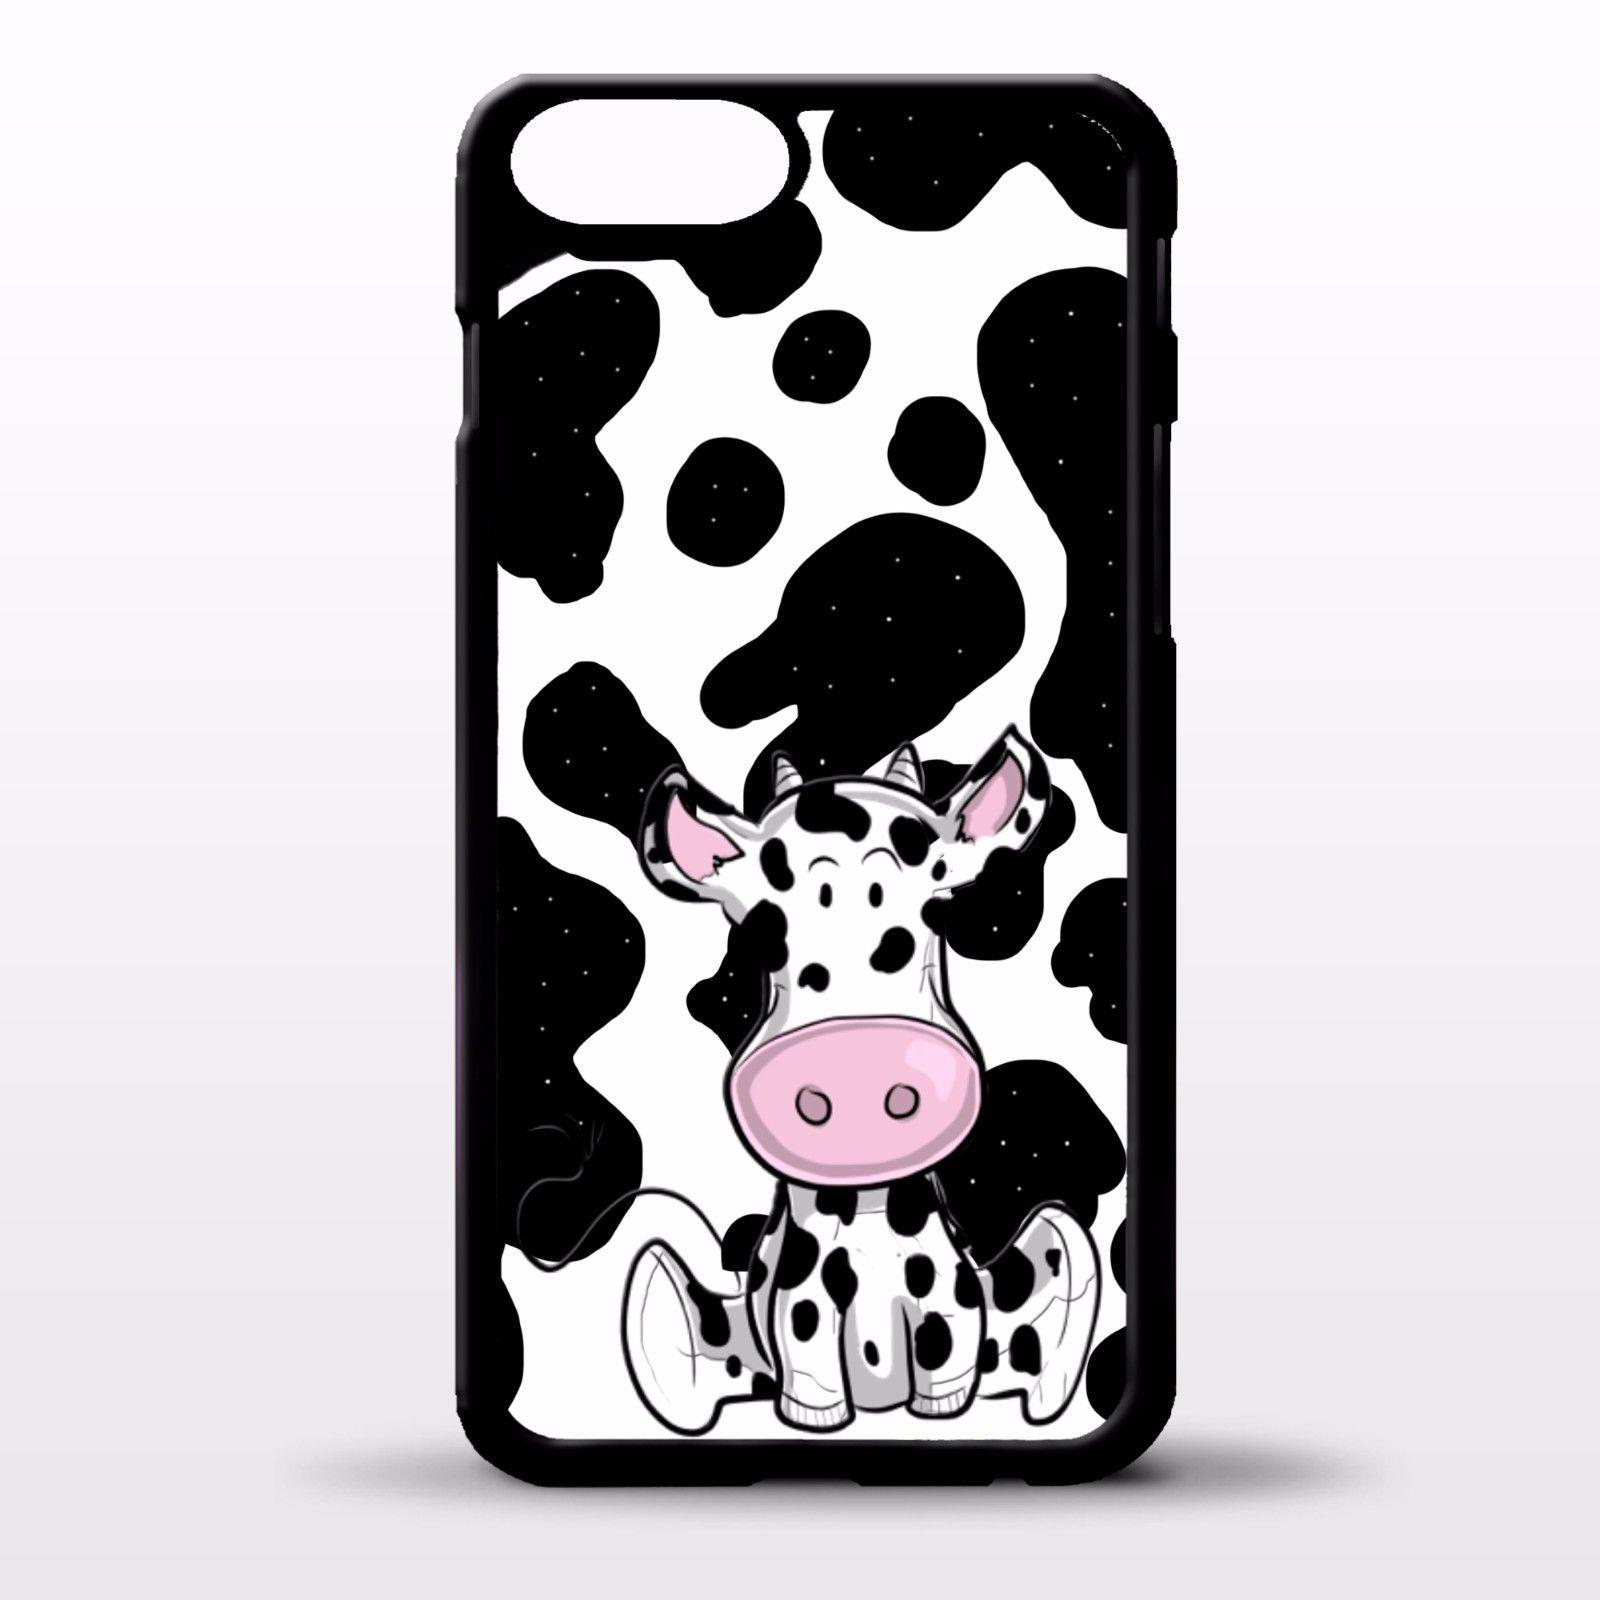 Cow cute spot cartoon print art pattern cover case for